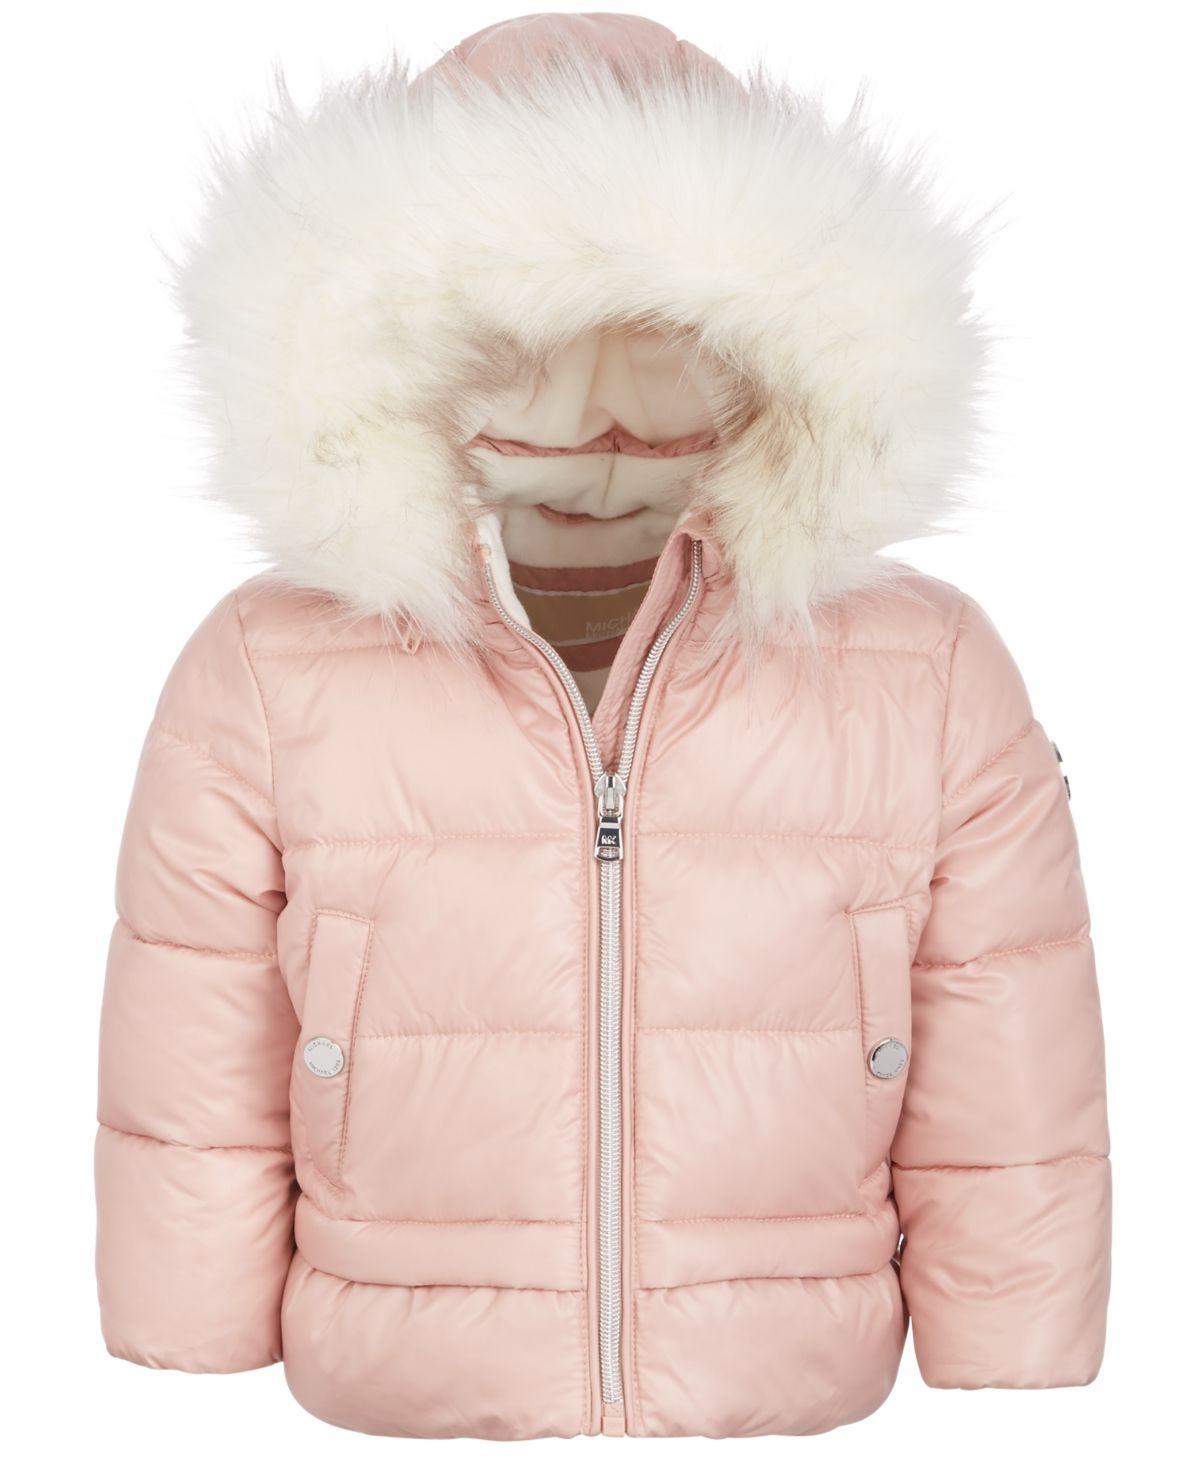 Pin By Tamara On Baby Clothes Wish List Puffer Jacket Fur Hood Girls Puffer Jacket Girls Faux Fur [ 1467 x 1200 Pixel ]